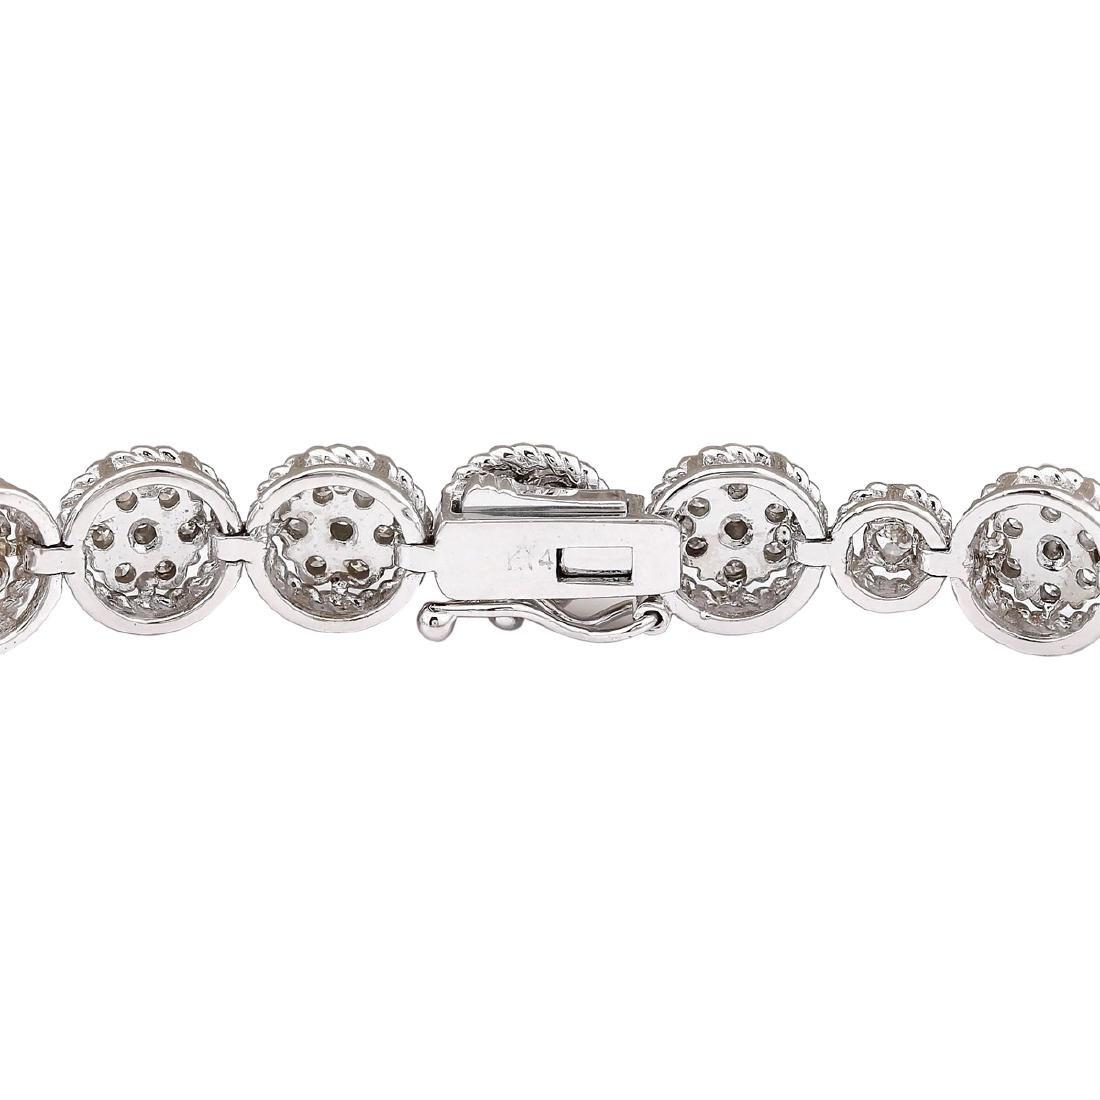 3.75 CTW Natural Diamond Bracelet In 18K White Gold - 2